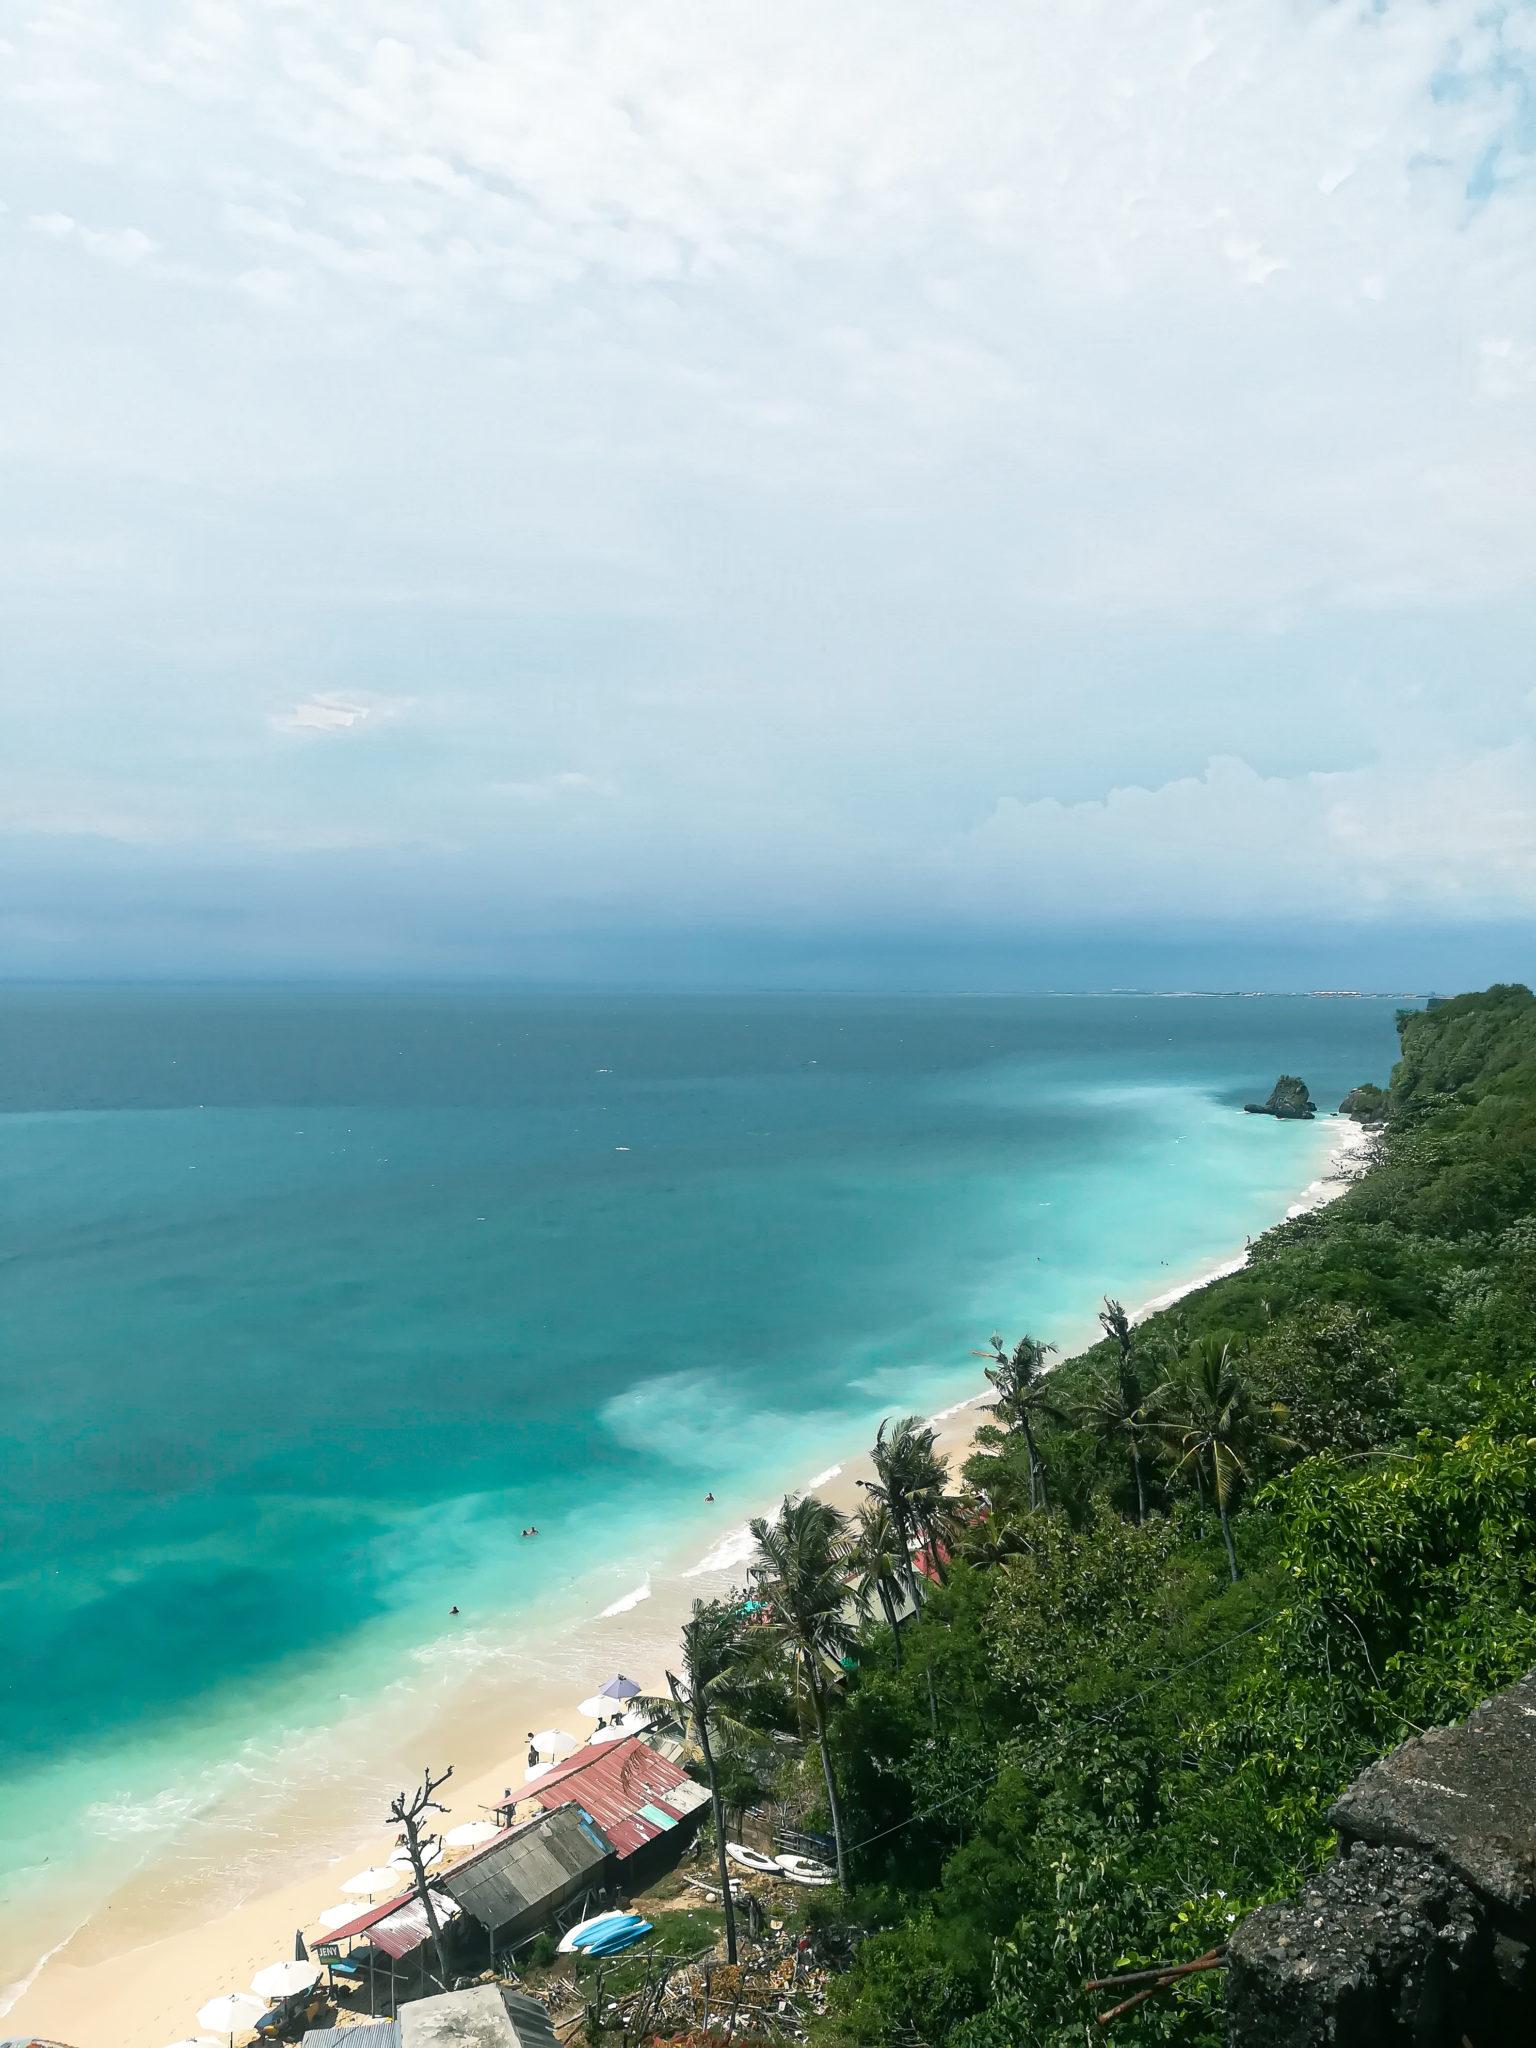 Padang Padang: most beautiful beach on the Bali 2 week itinerary